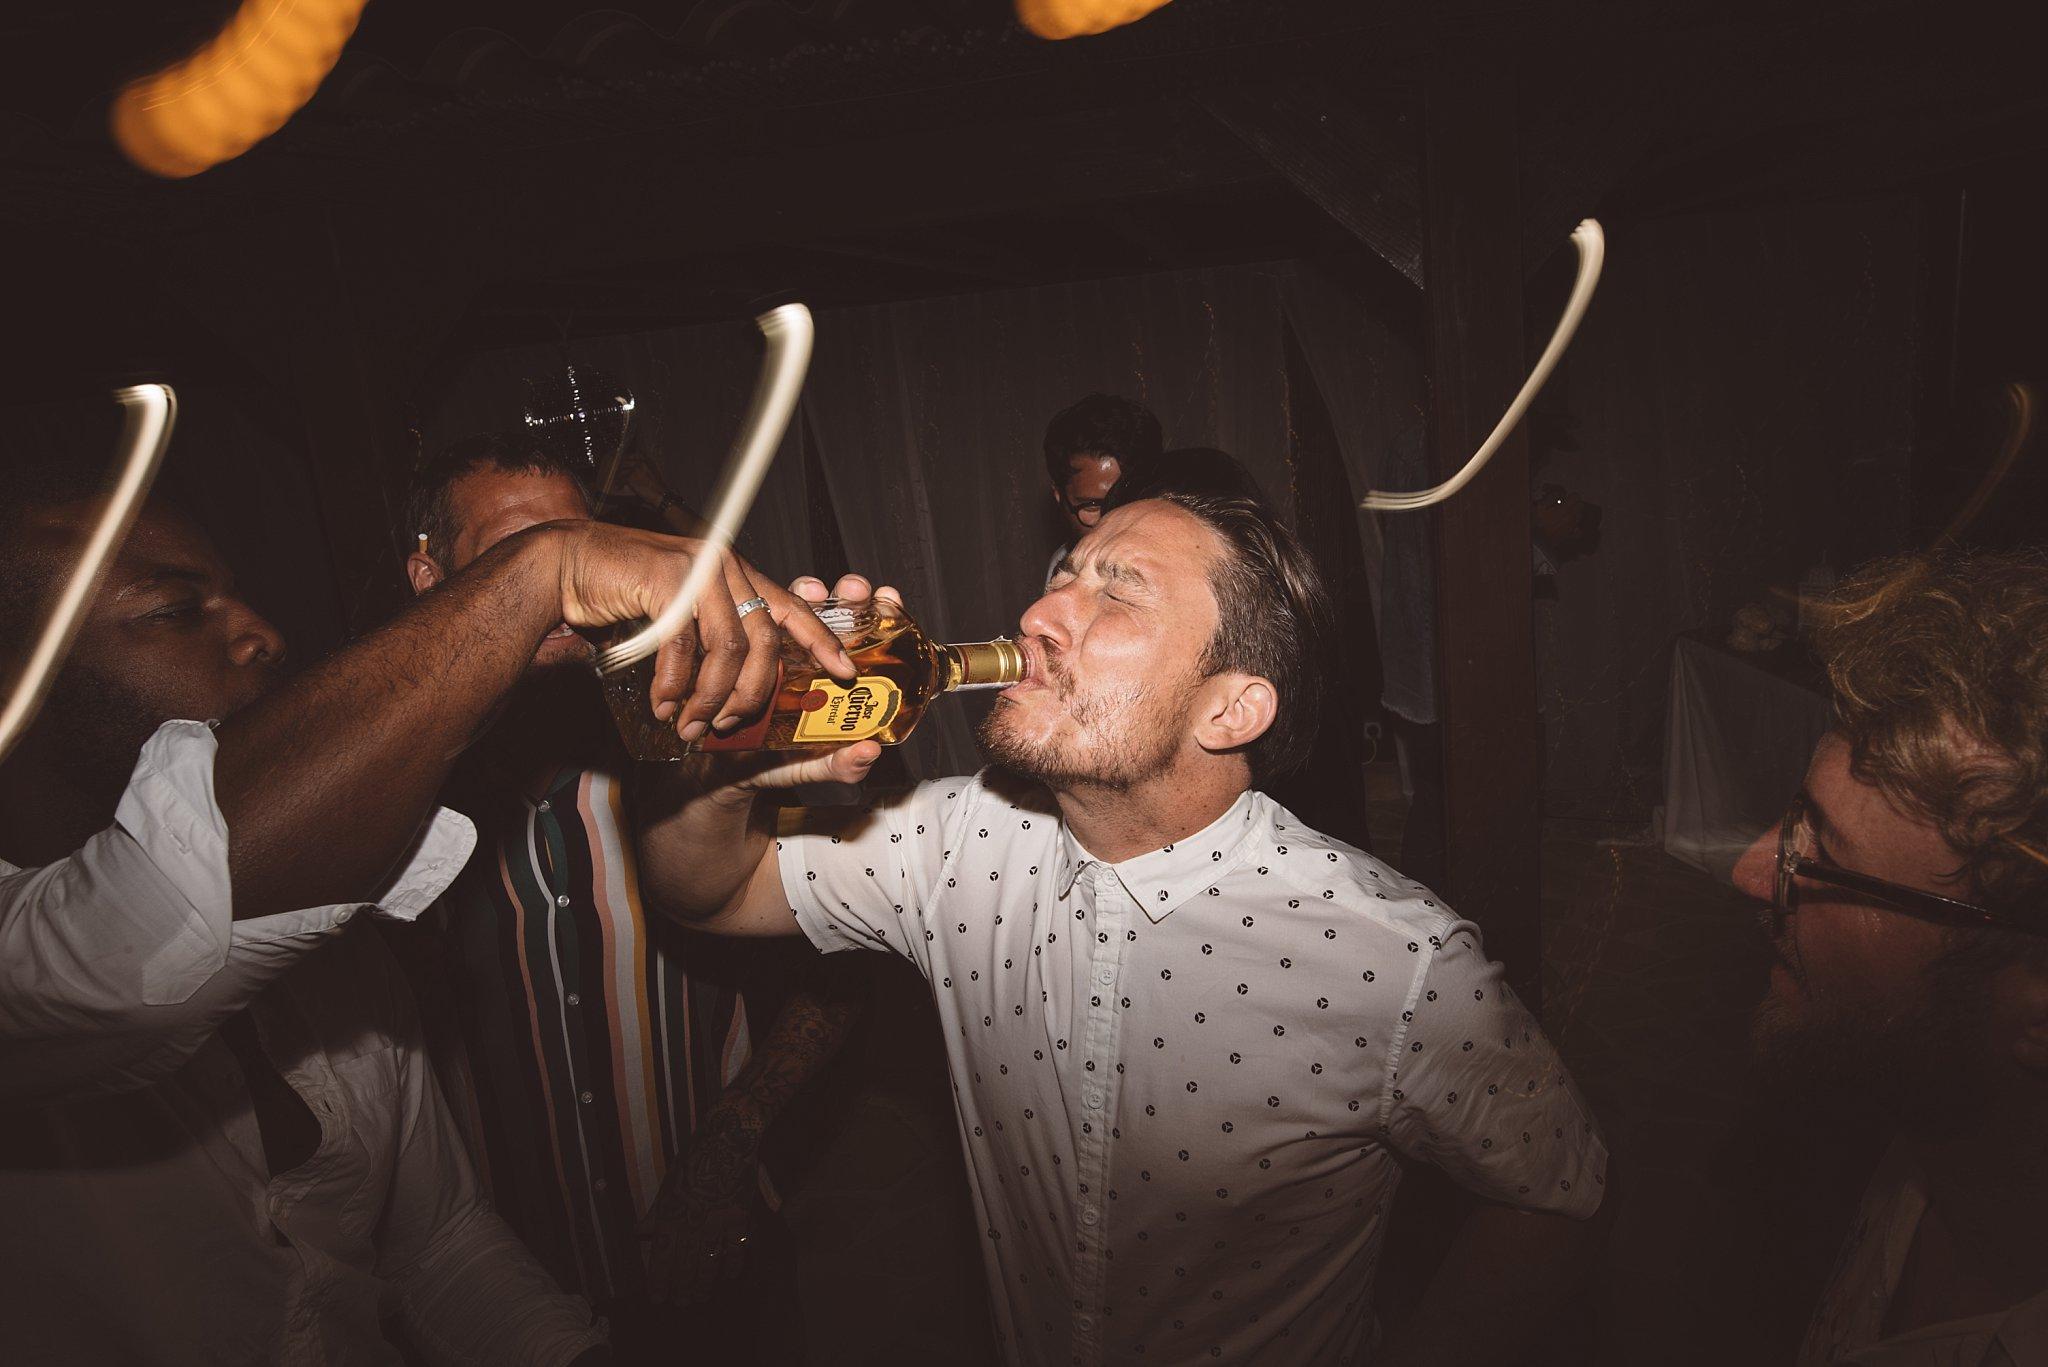 dragging the shutter at a fun Ibiza wedding